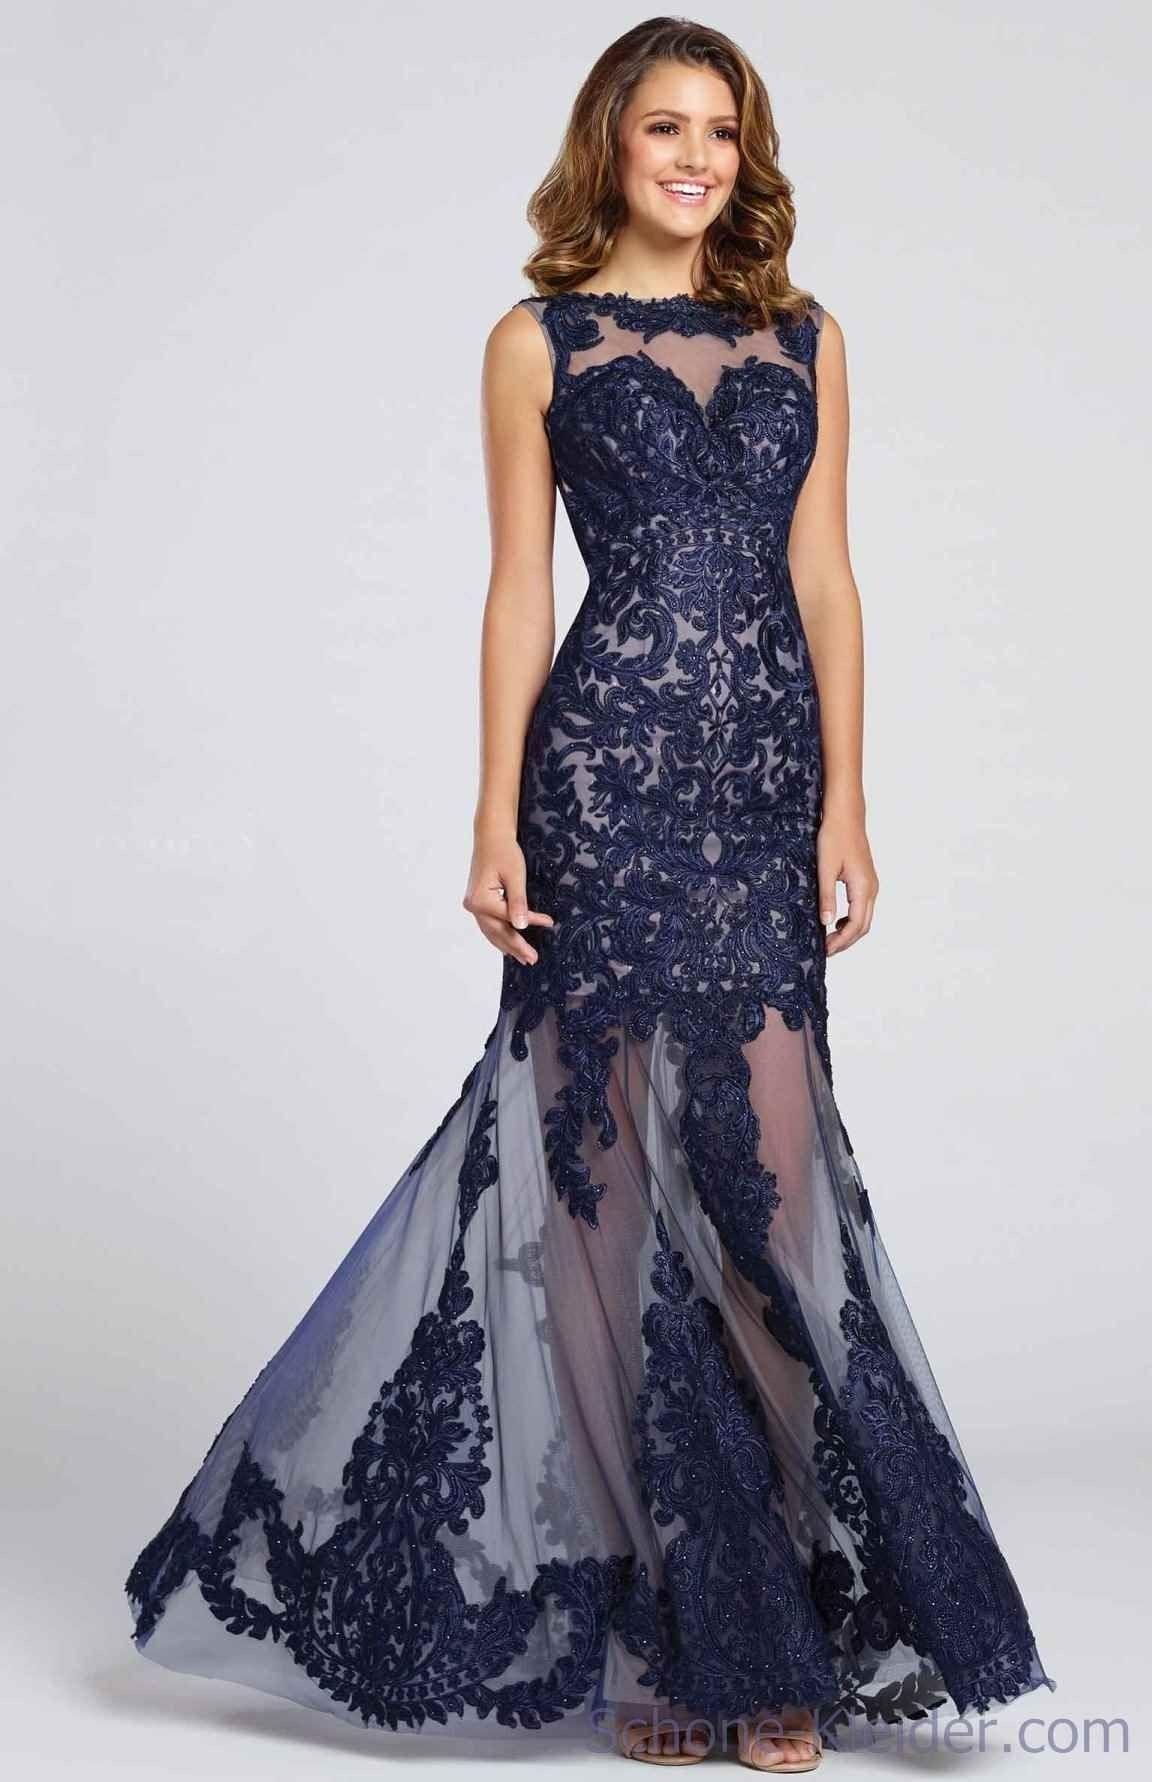 Formal Schön Elegante Abendkleider Lang StylishFormal Luxurius Elegante Abendkleider Lang Bester Preis